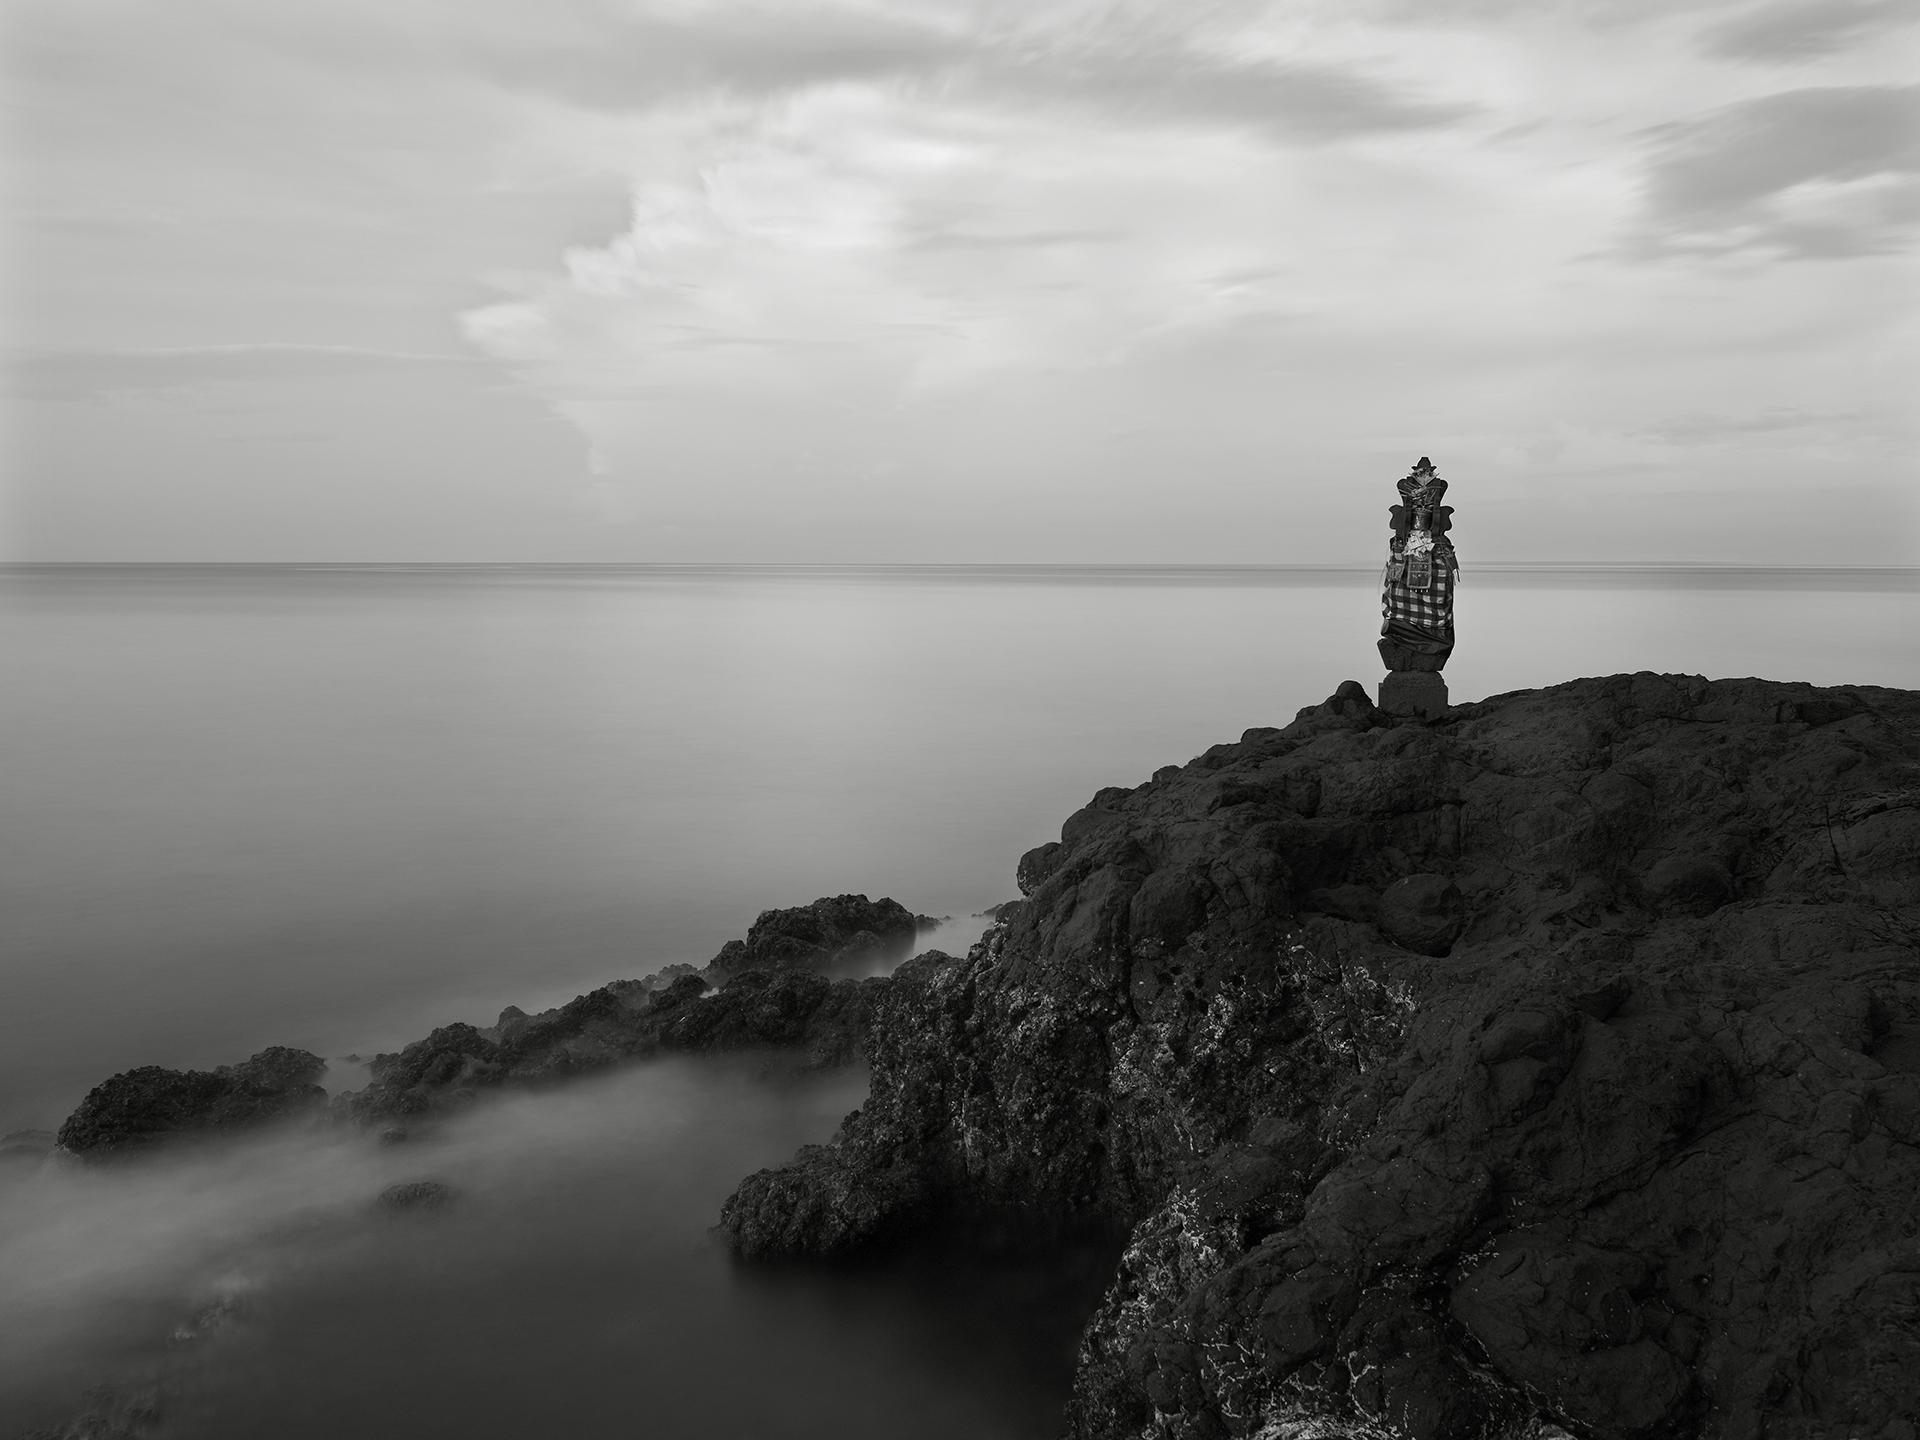 Offerings to the Sea #3, Bali - 2010 copy.jpg